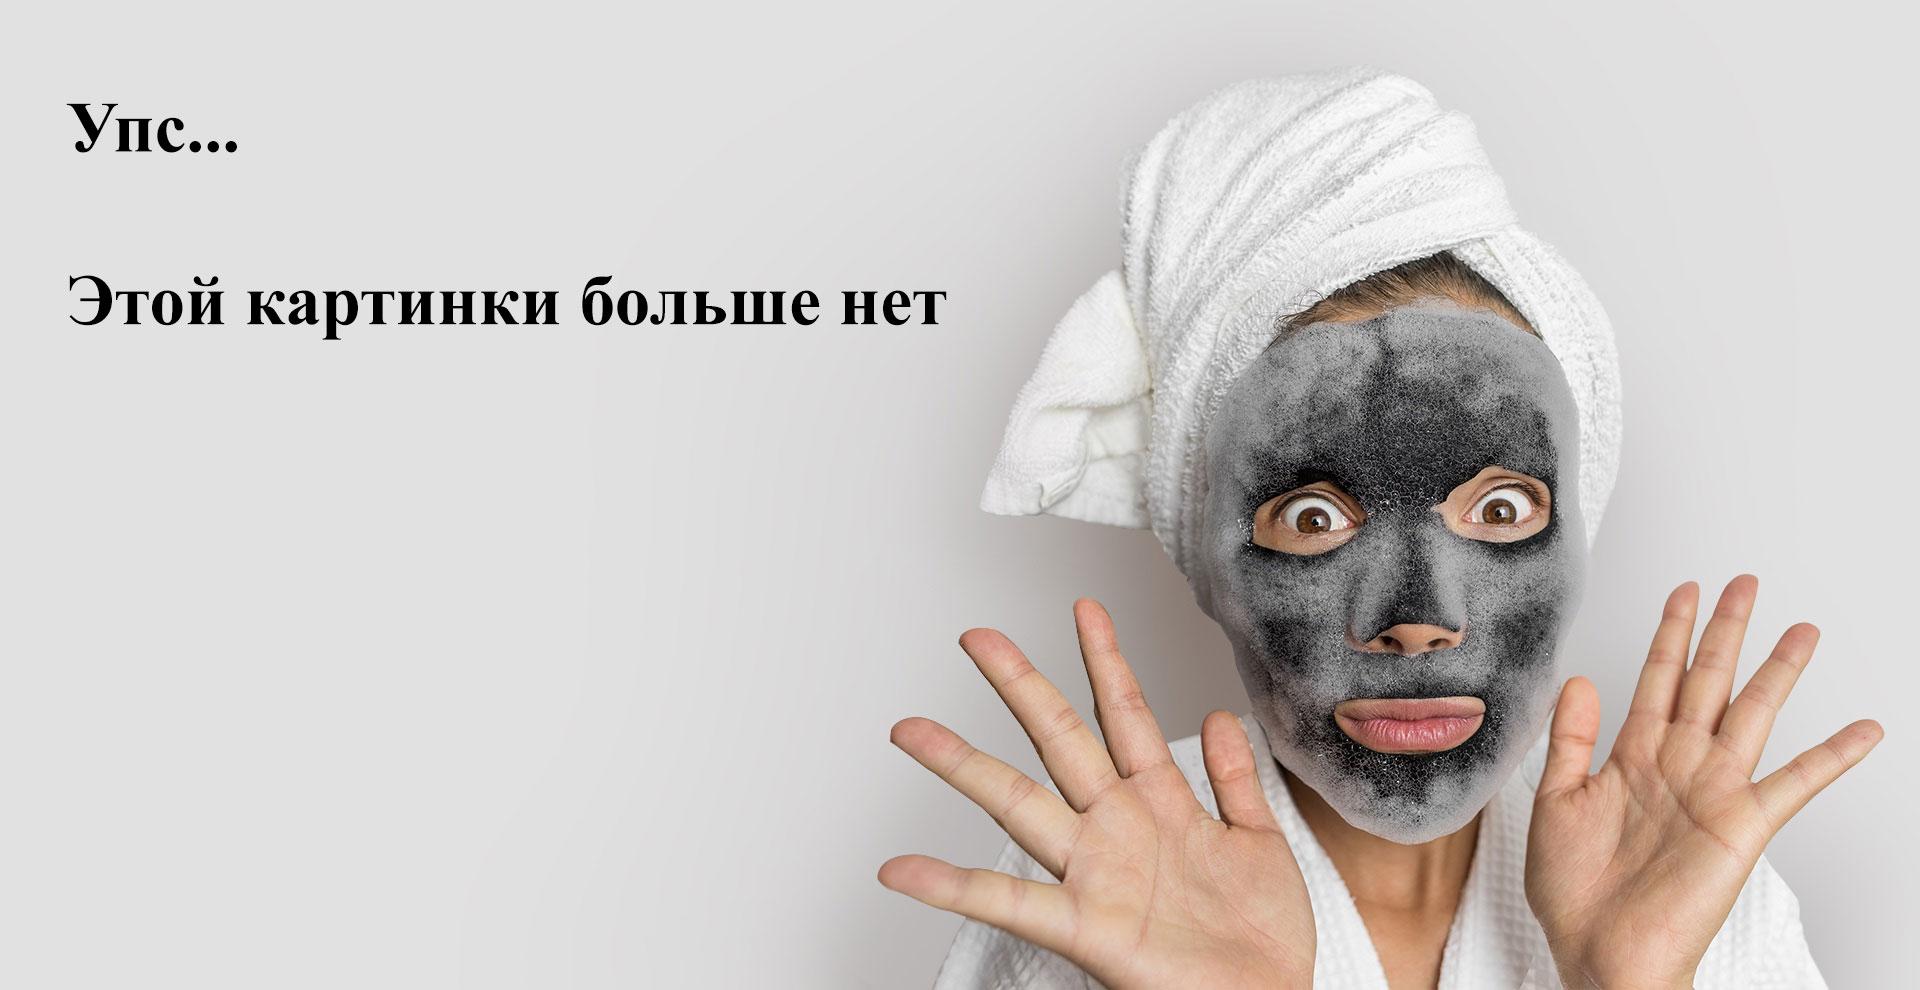 Skinlite, Маска расслабляющая для мужчин, 1 шт